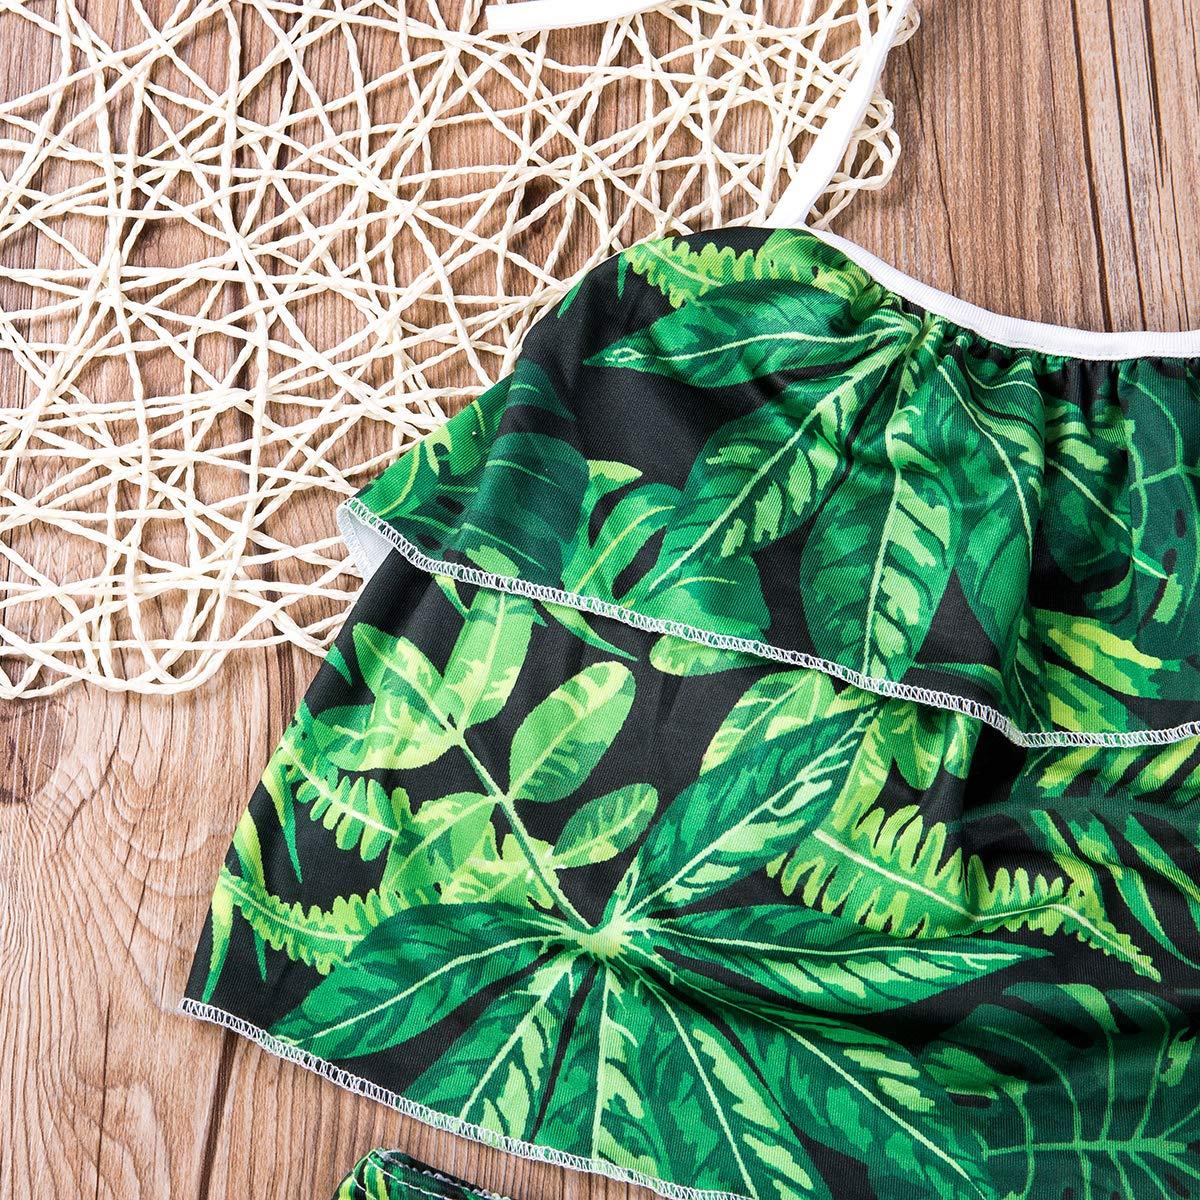 Swinsuit for Women and Girl Family Matching Two-Pieces Ruffle Pleated Halter Neck High Waist Swimsuit Beach Wear Bikini Set